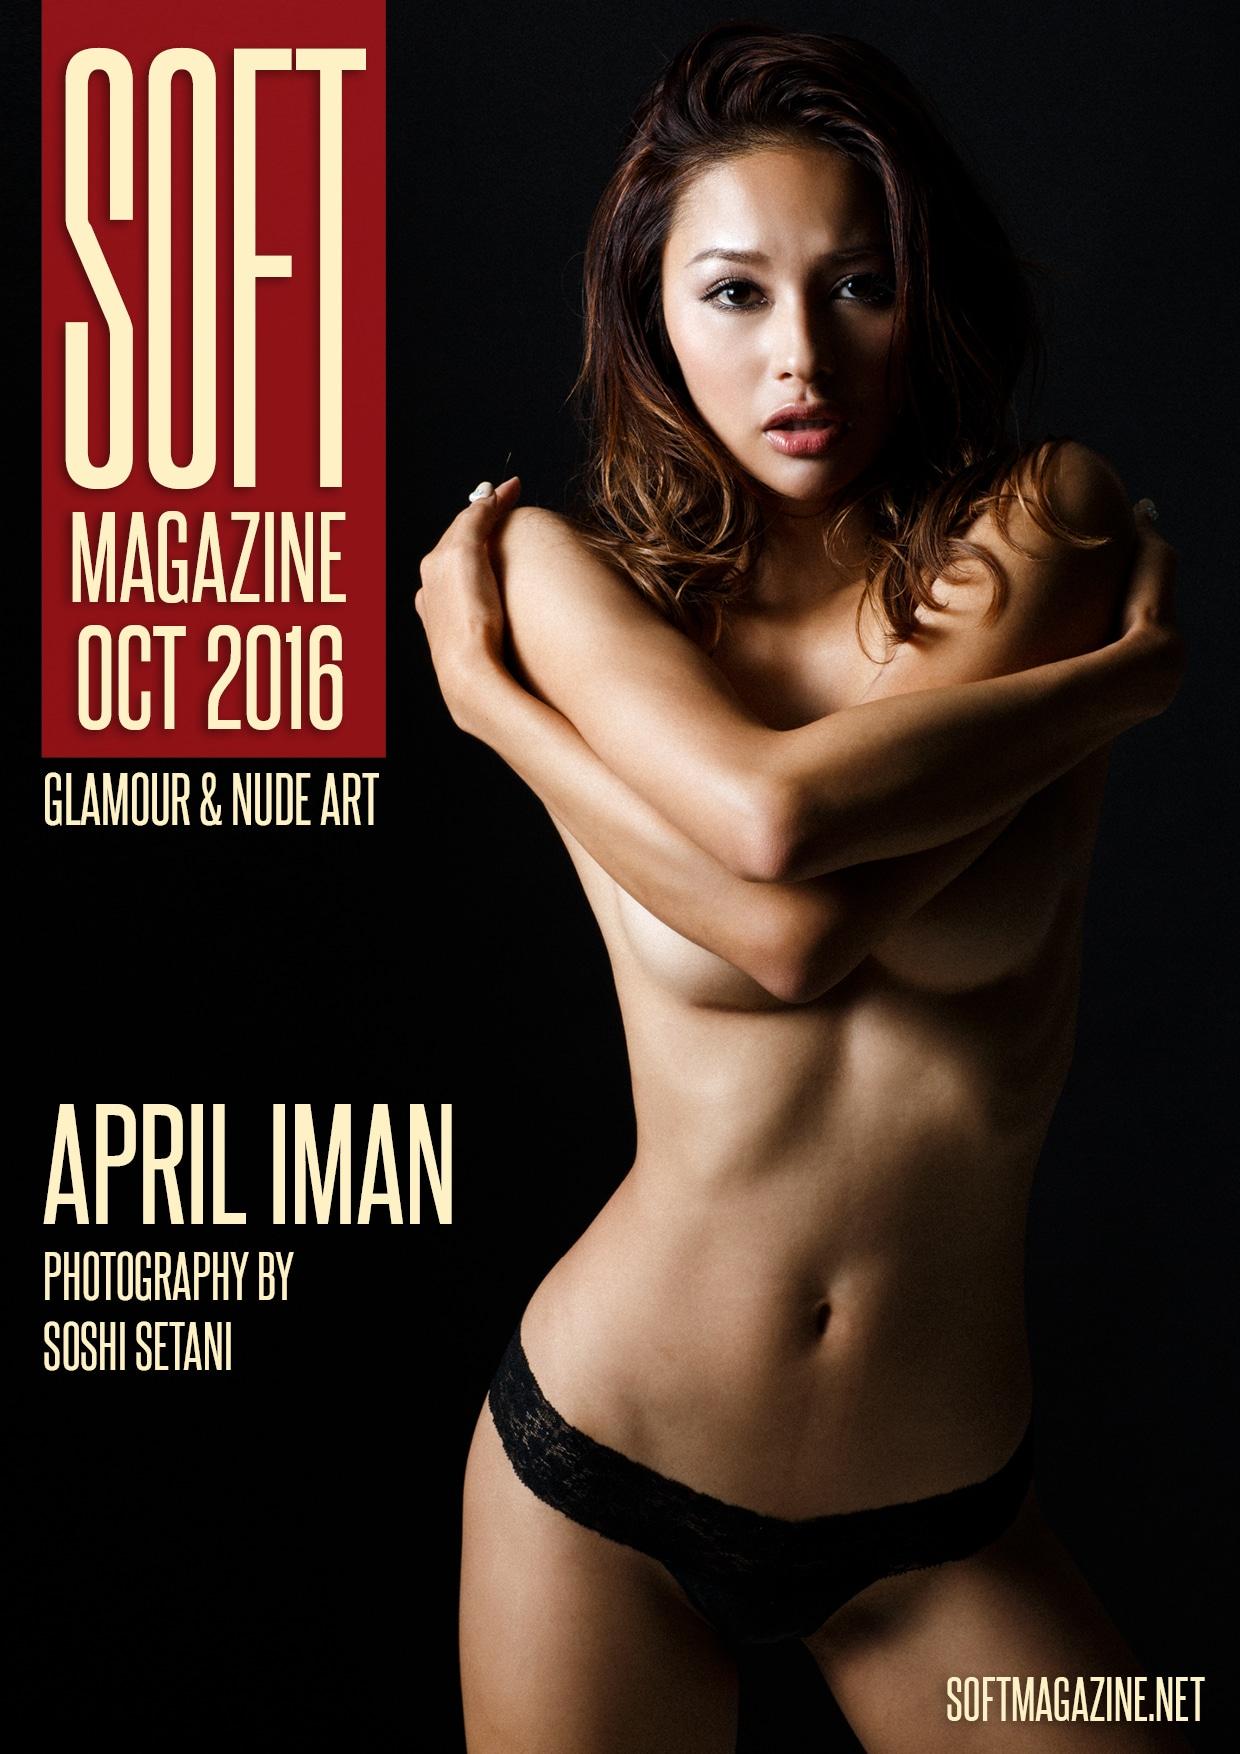 Soft Magazine - October 2016 - April Iman 1